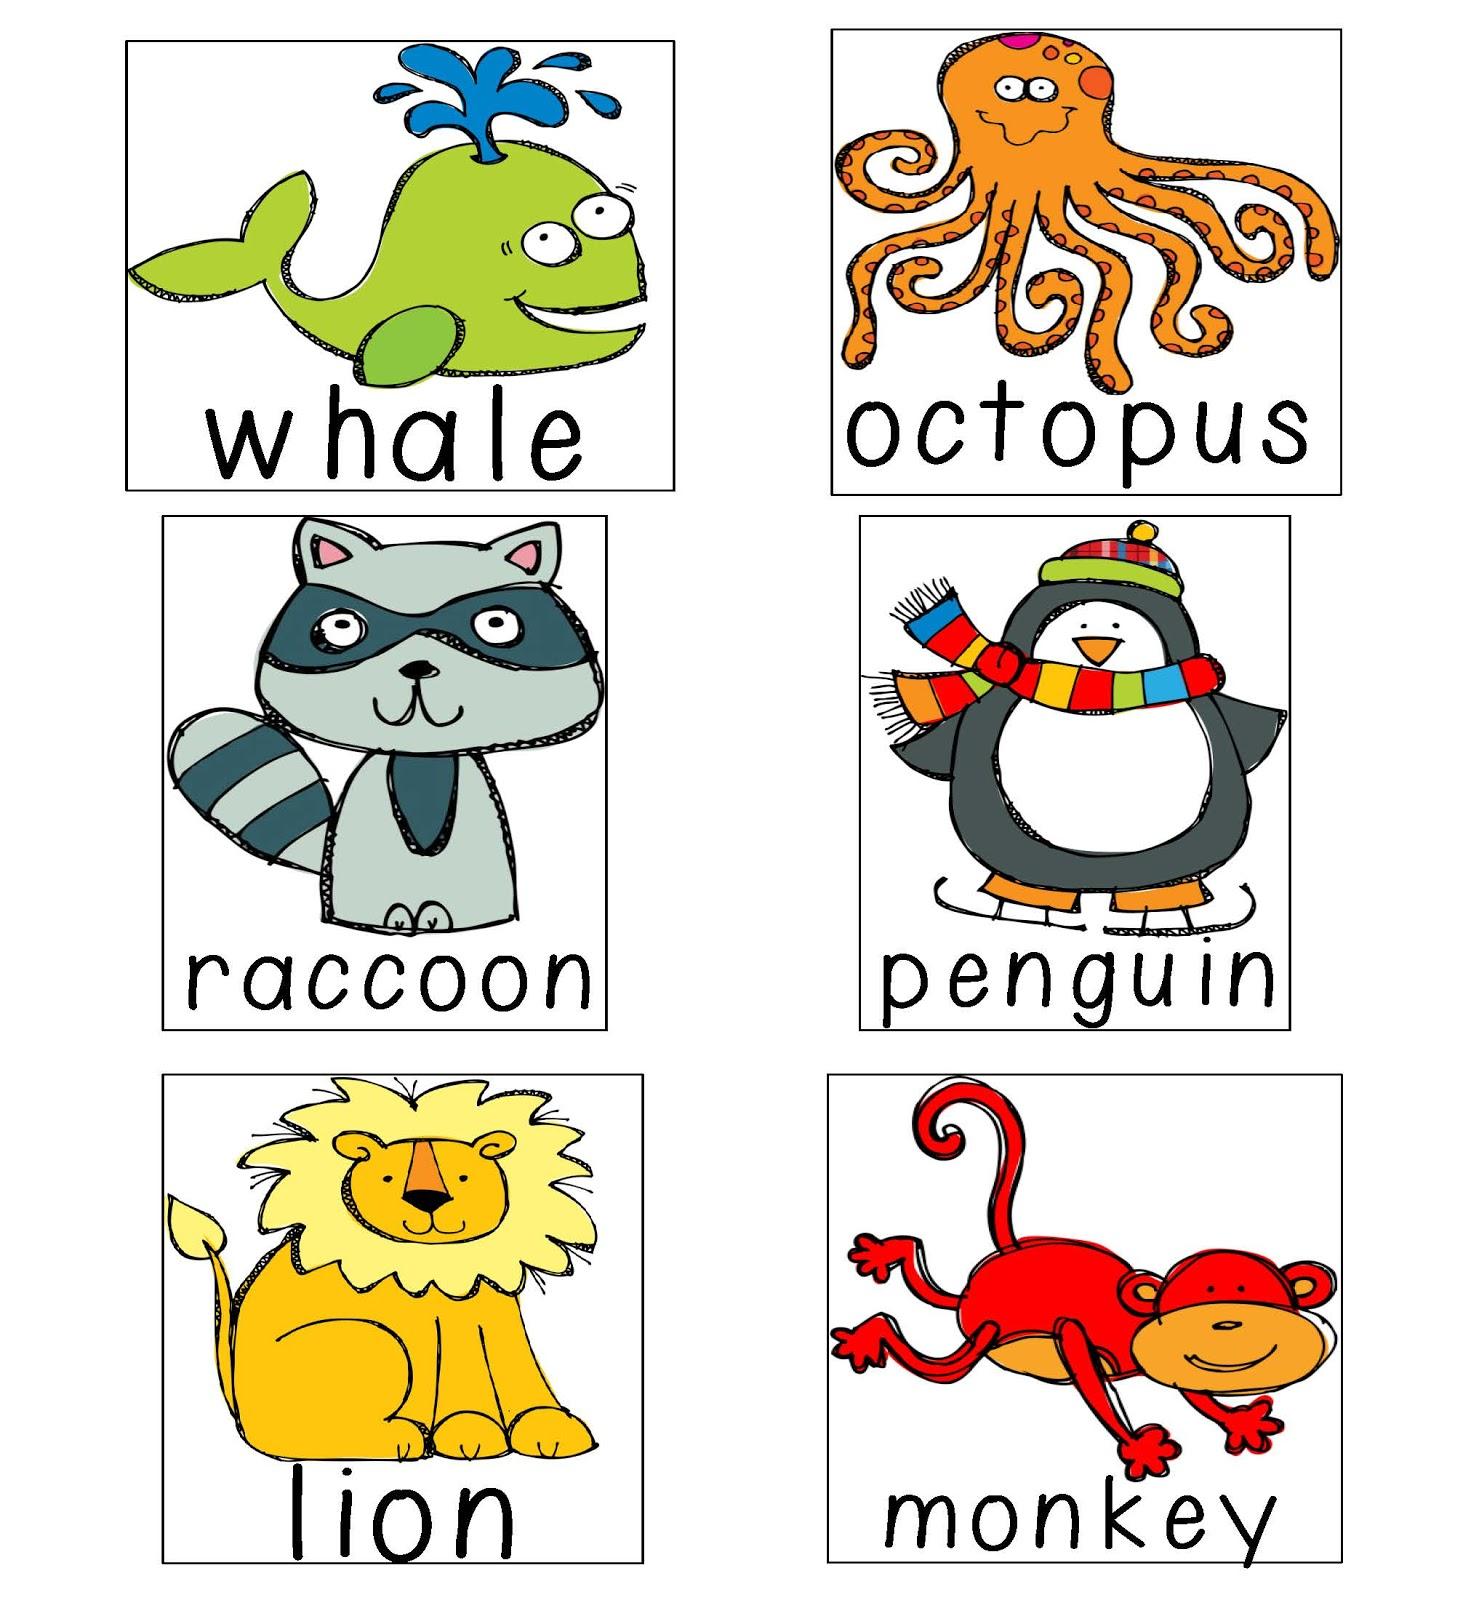 Oviparous animals list